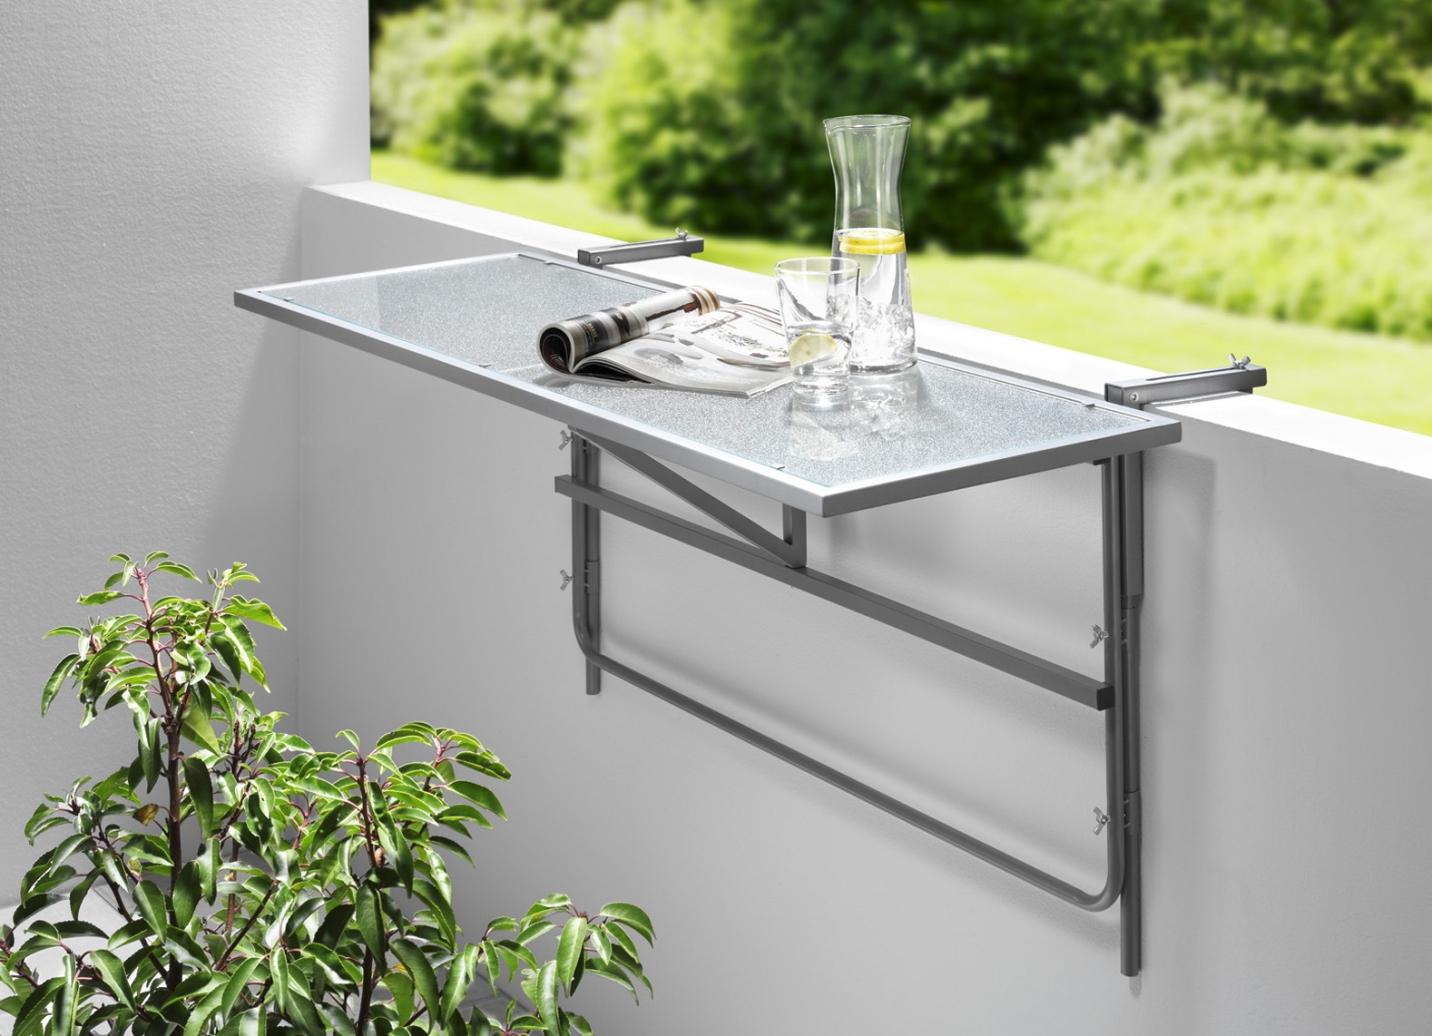 balkon h ngetisch in verschiedenen ausf hrungen. Black Bedroom Furniture Sets. Home Design Ideas